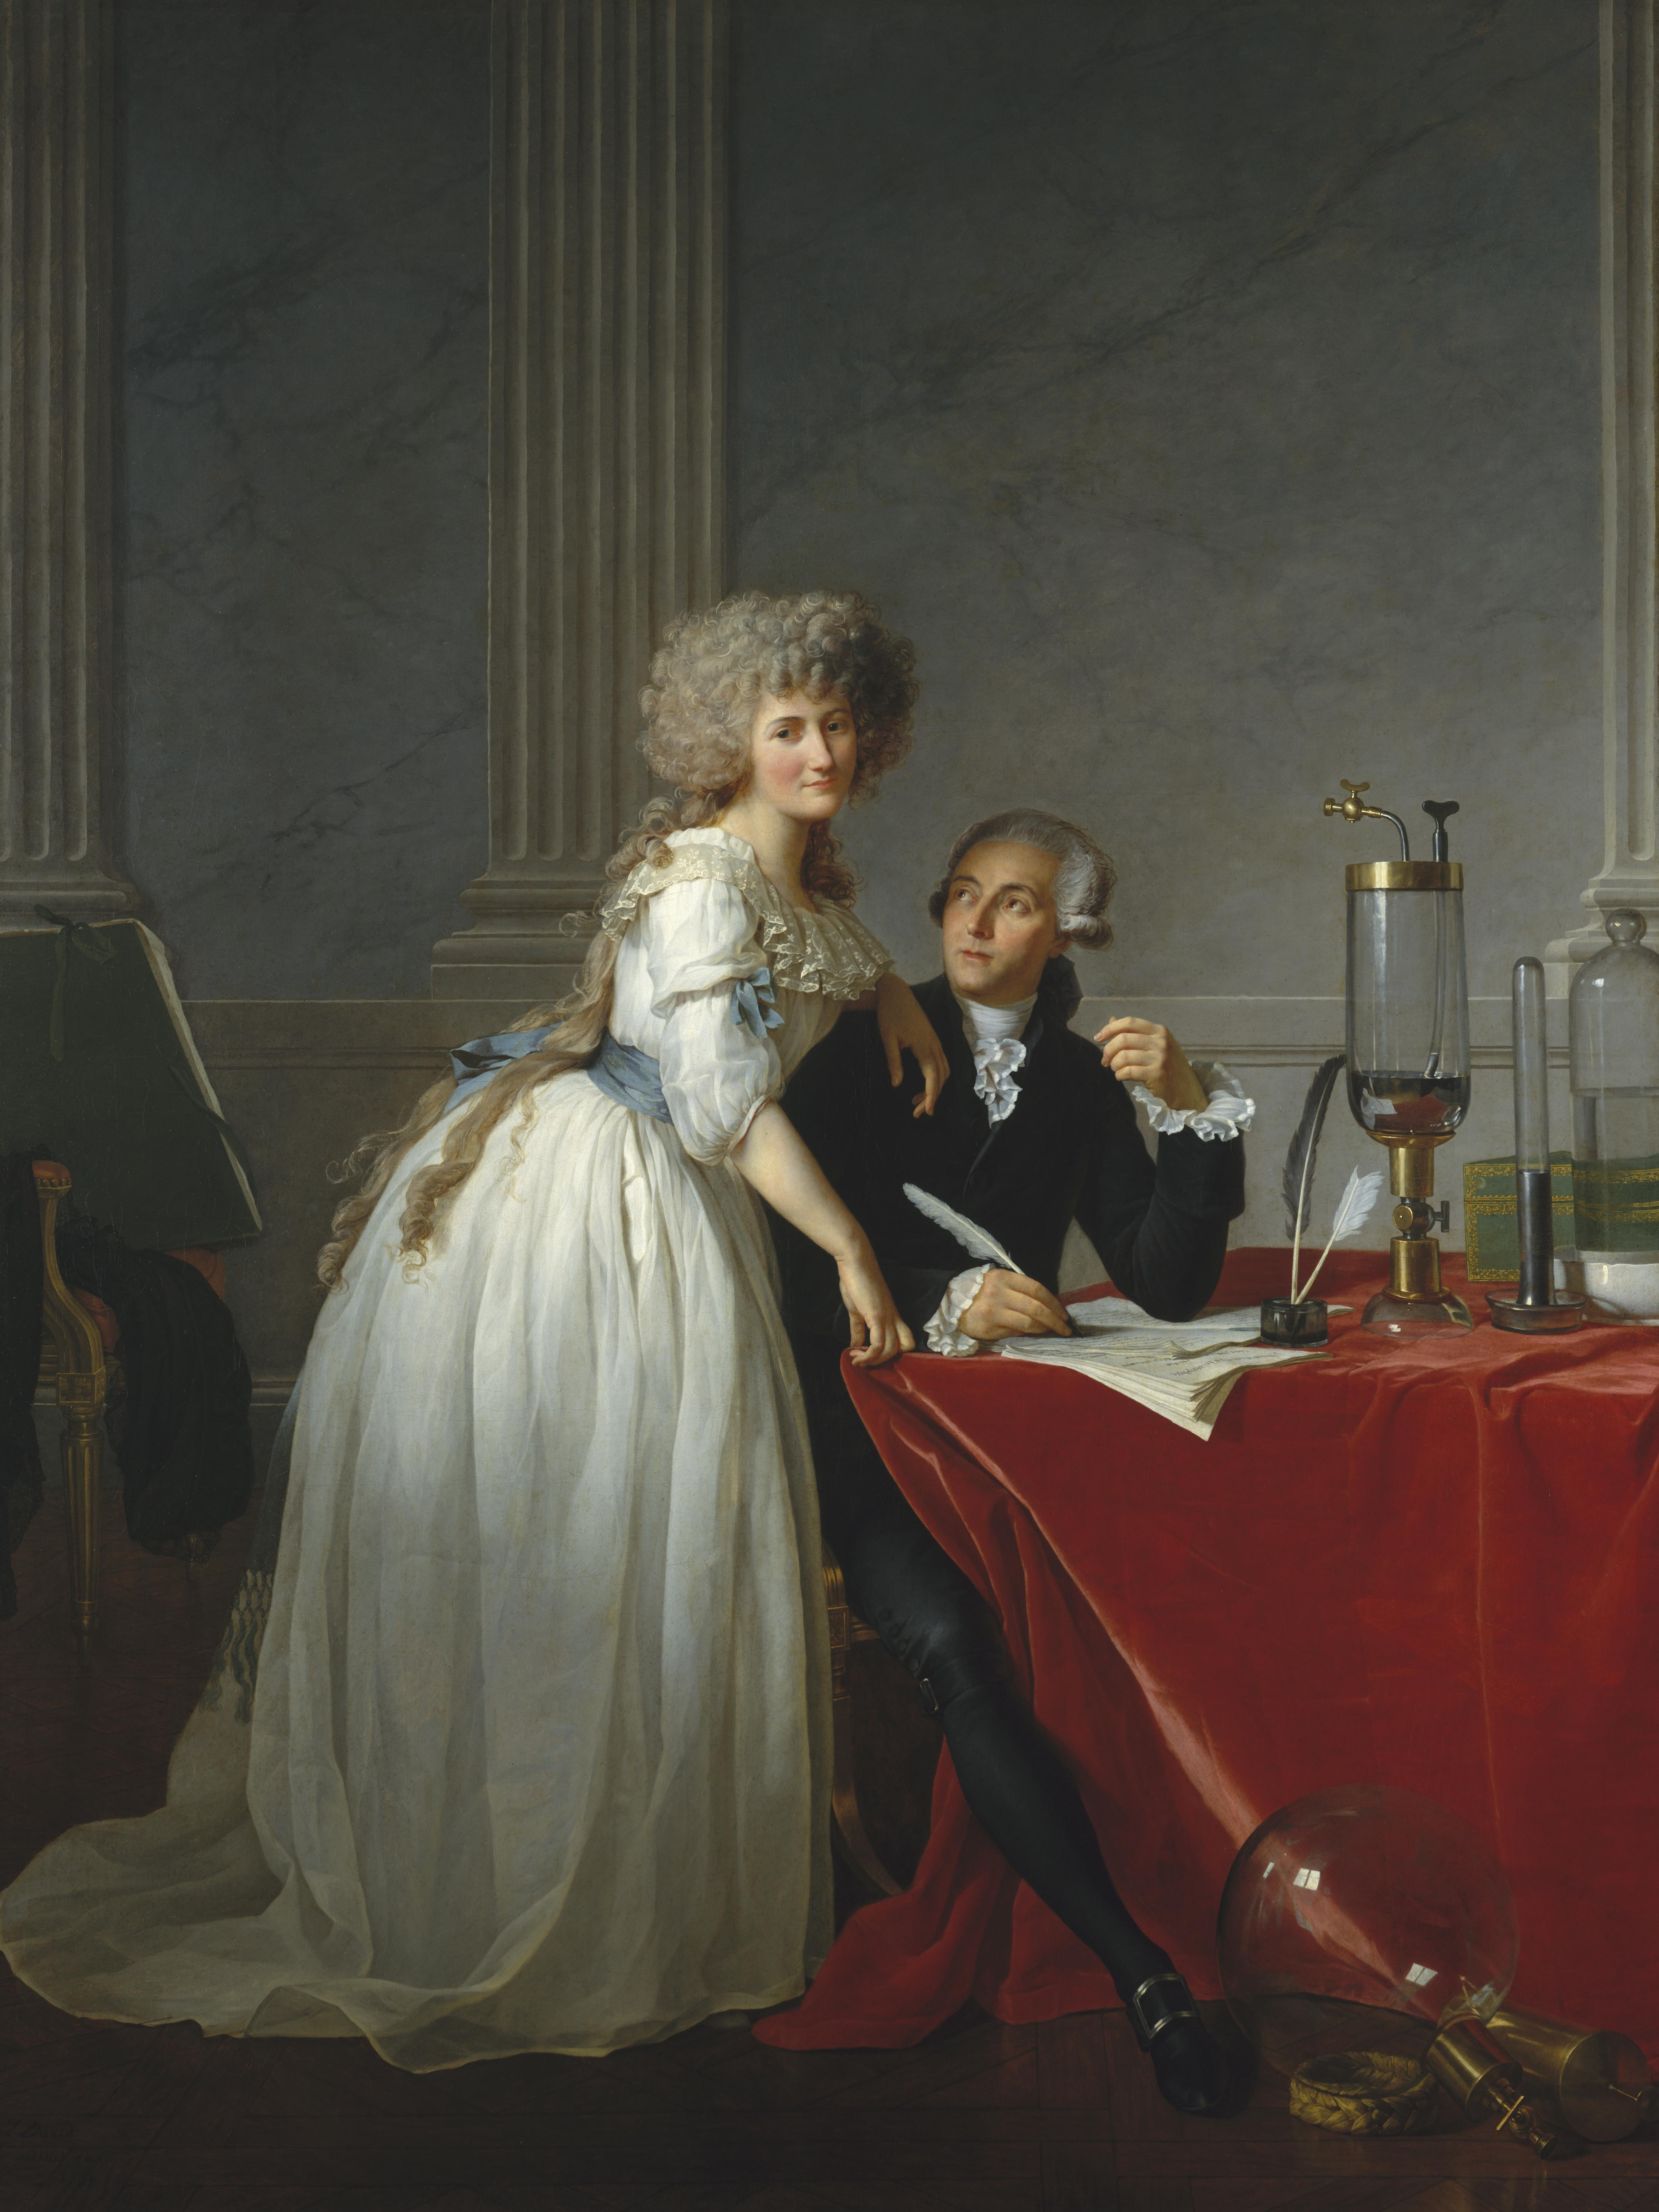 David_-_Portrait_of_Monsieur_Lavoisier_and_His_Wife.jpg